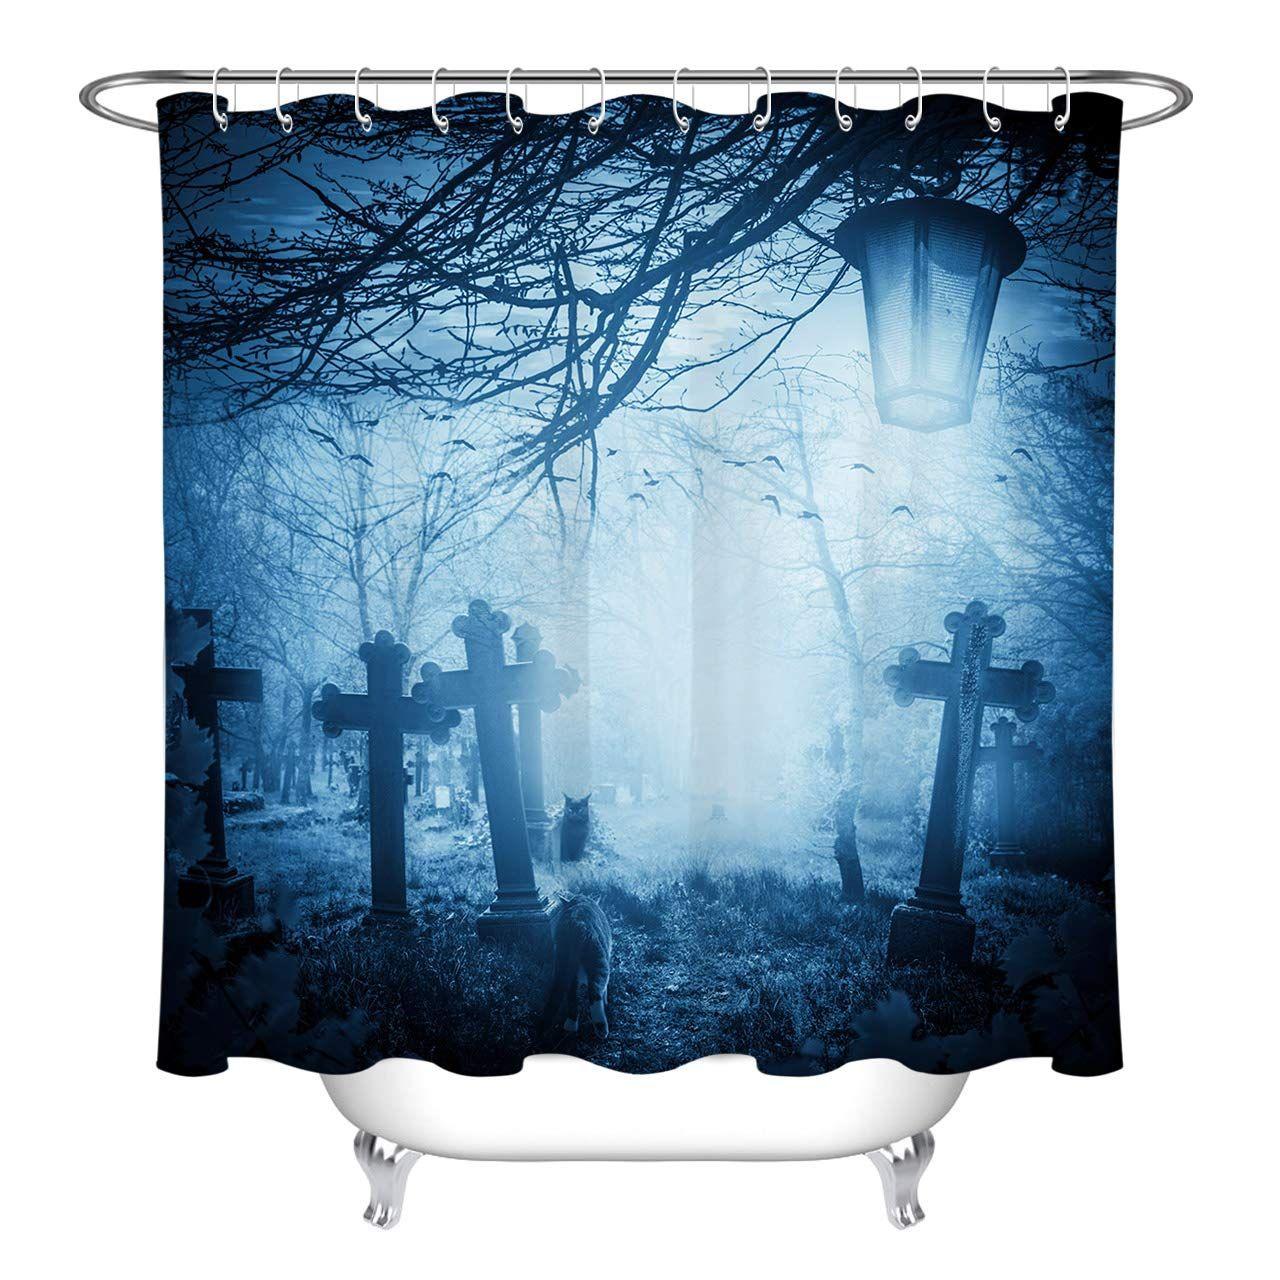 Lb Spooky Grave In Dark Forest Woods Artistic Shower Curtain Halloween Horror Themed Bathroom 70 X Halloween Shower Curtain Fabric Shower Curtains Dark Forest